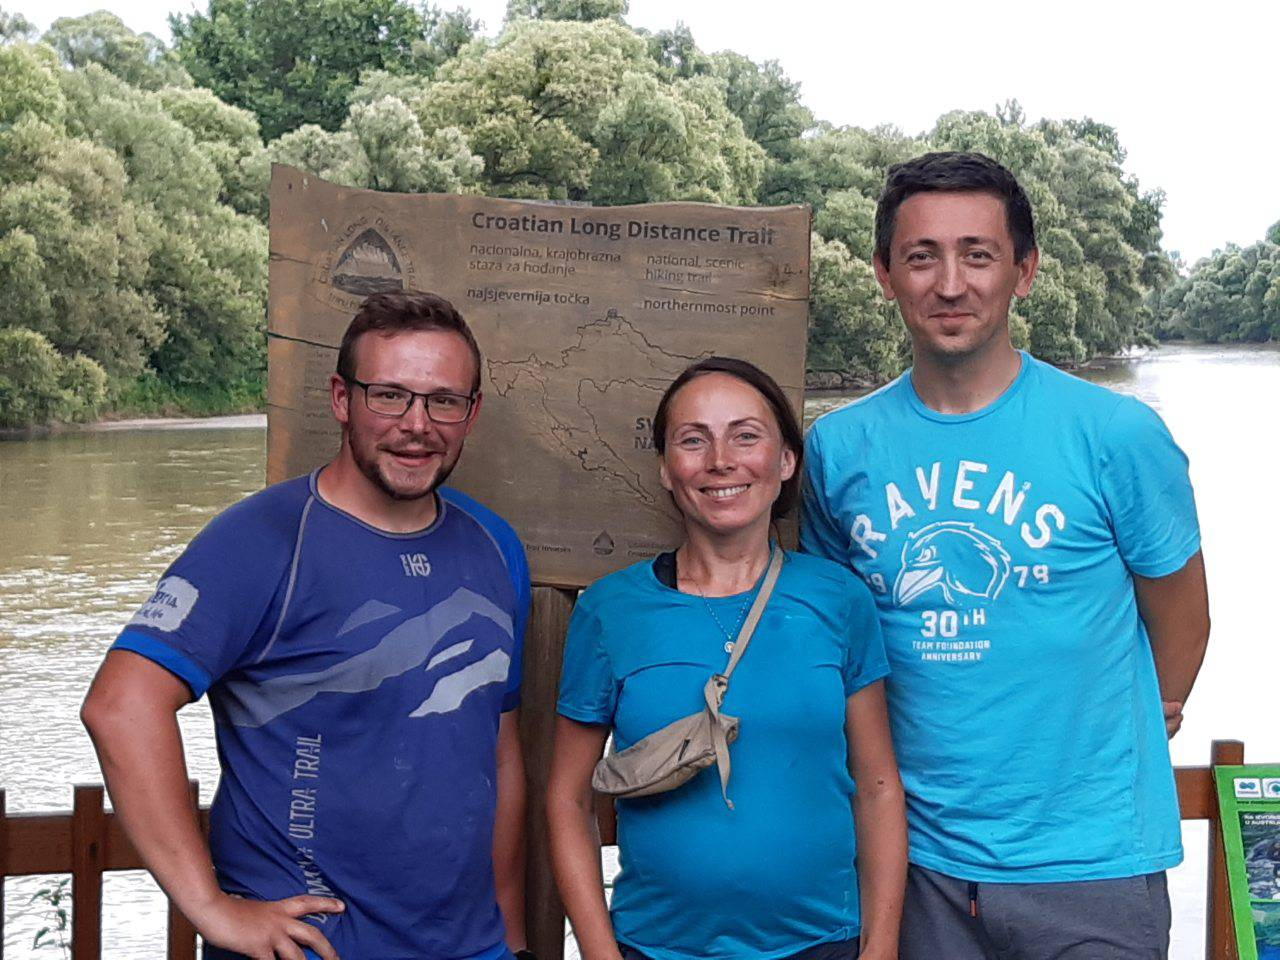 Strastvena planinarka: Trudna Kristina prehodala čak 580 km